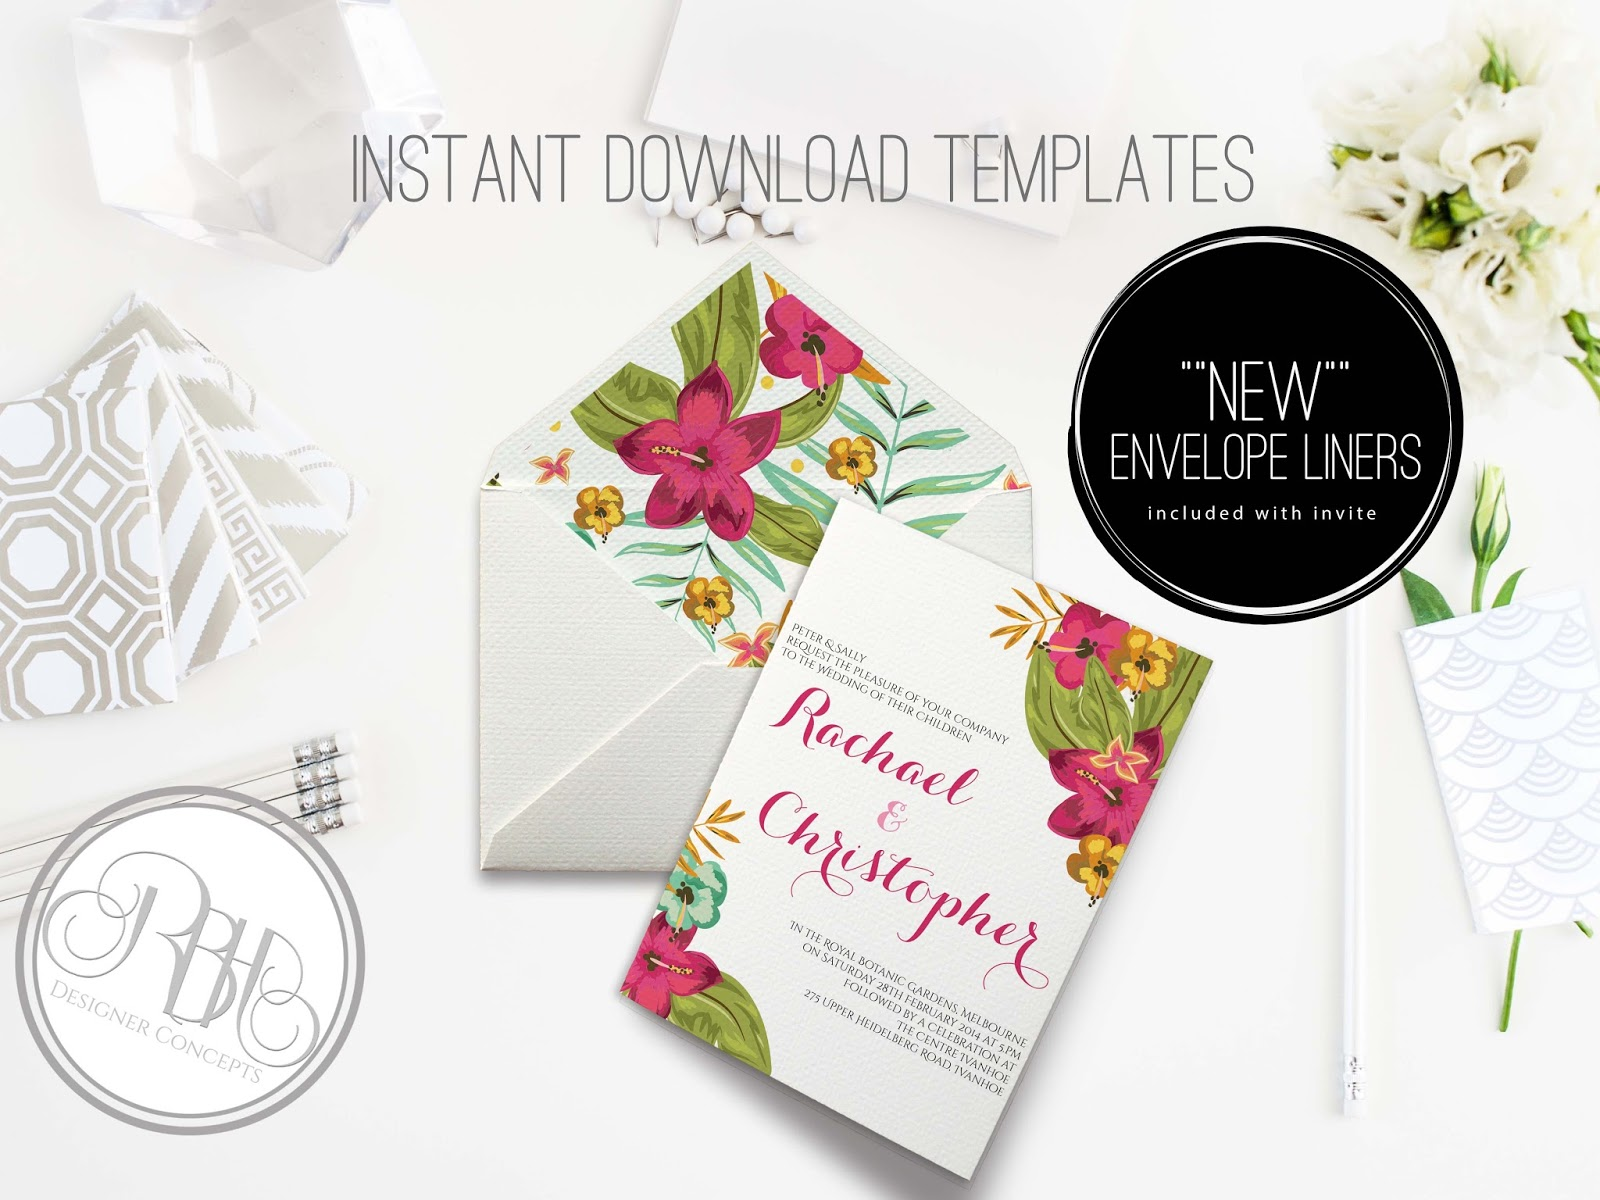 Tropical Watercolor Invitation Design INVITE RSVP ENVELOPE LINER